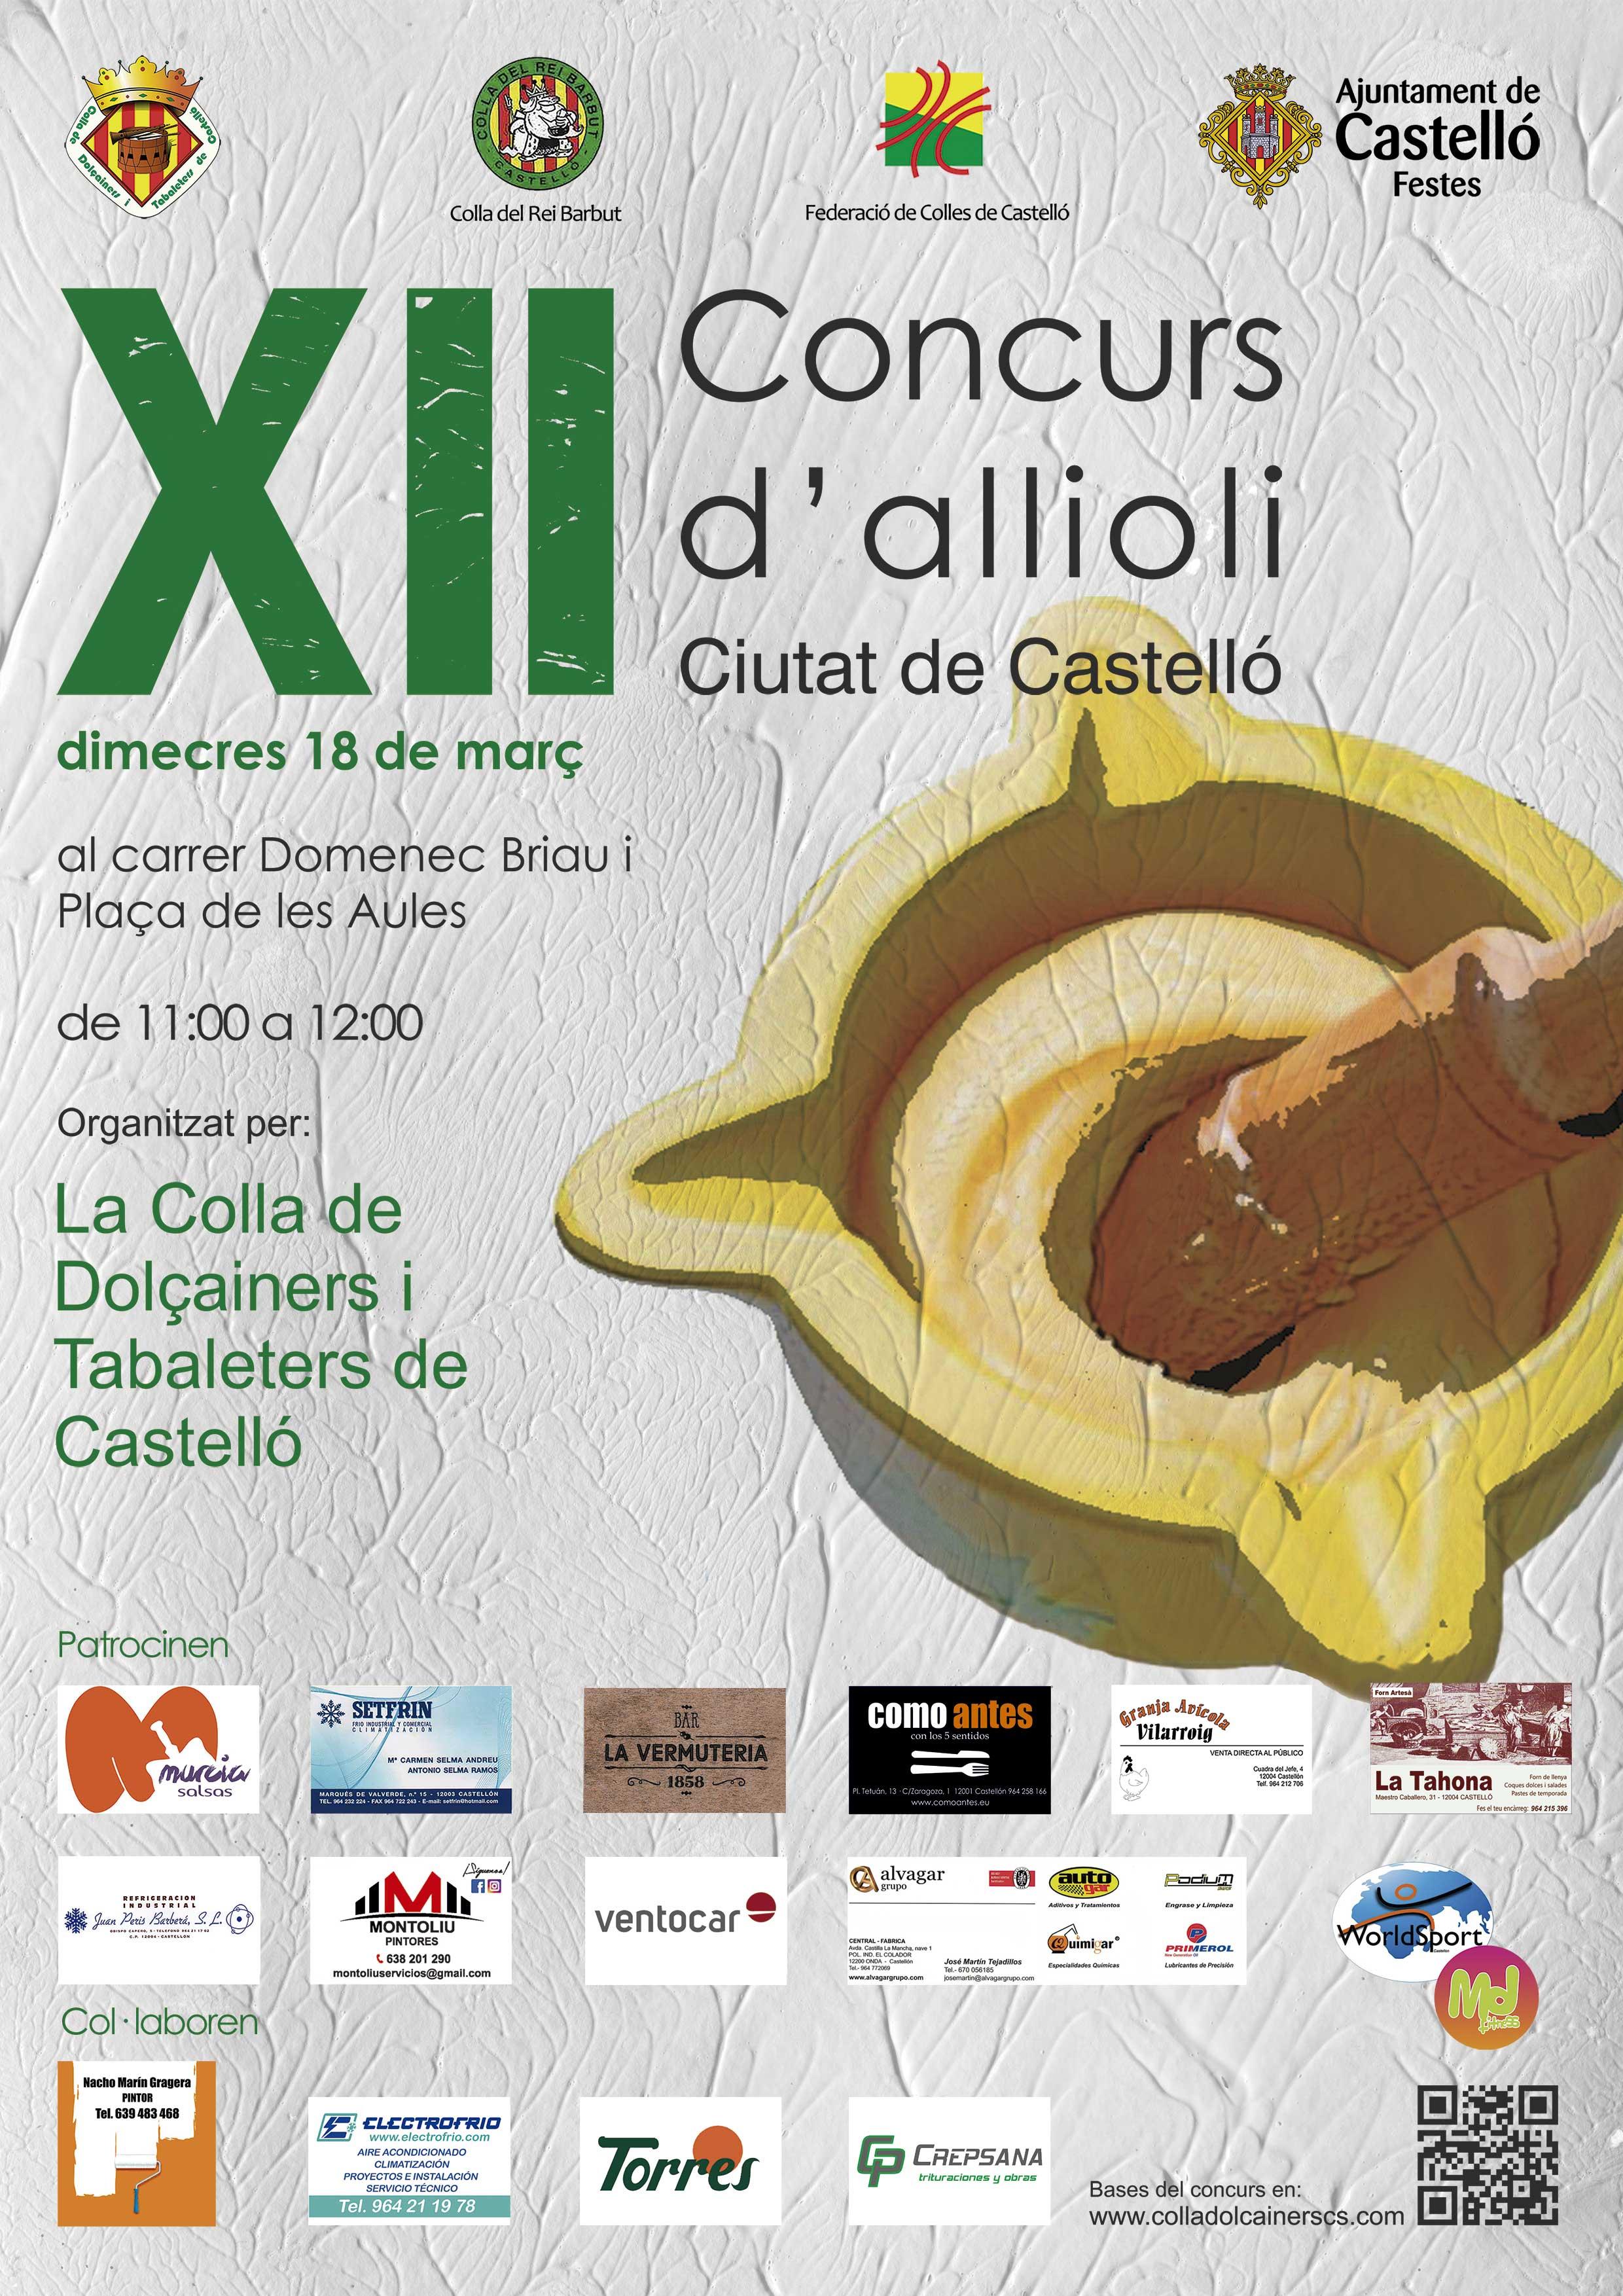 allioli2020-A4